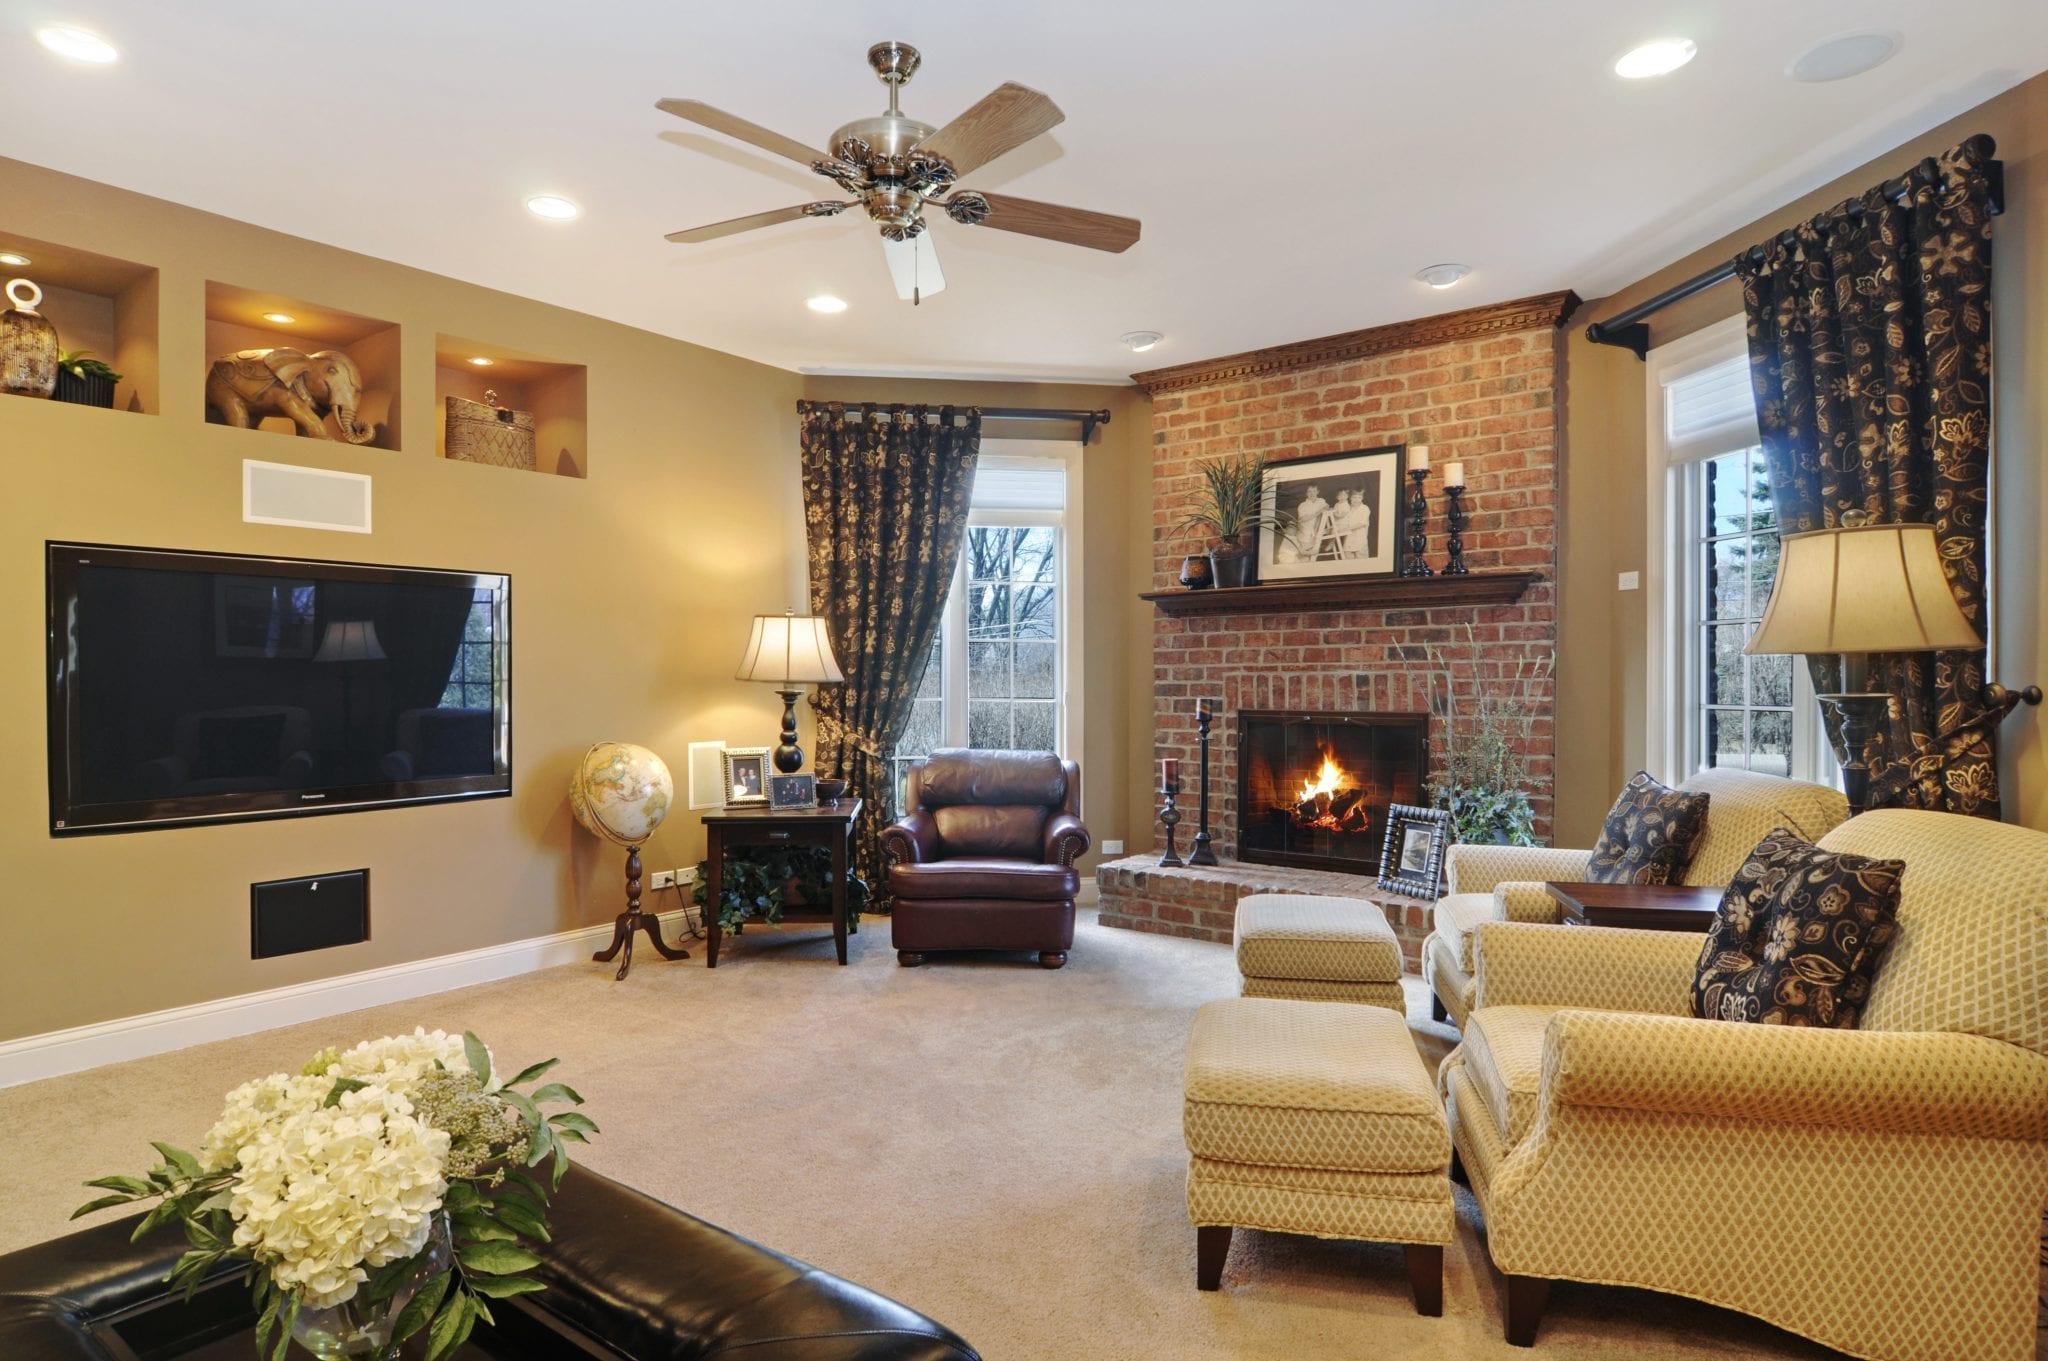 Interior Design solutions for Arlington Heights, Barrington, Deerfield, Libertyville, Lake Forest